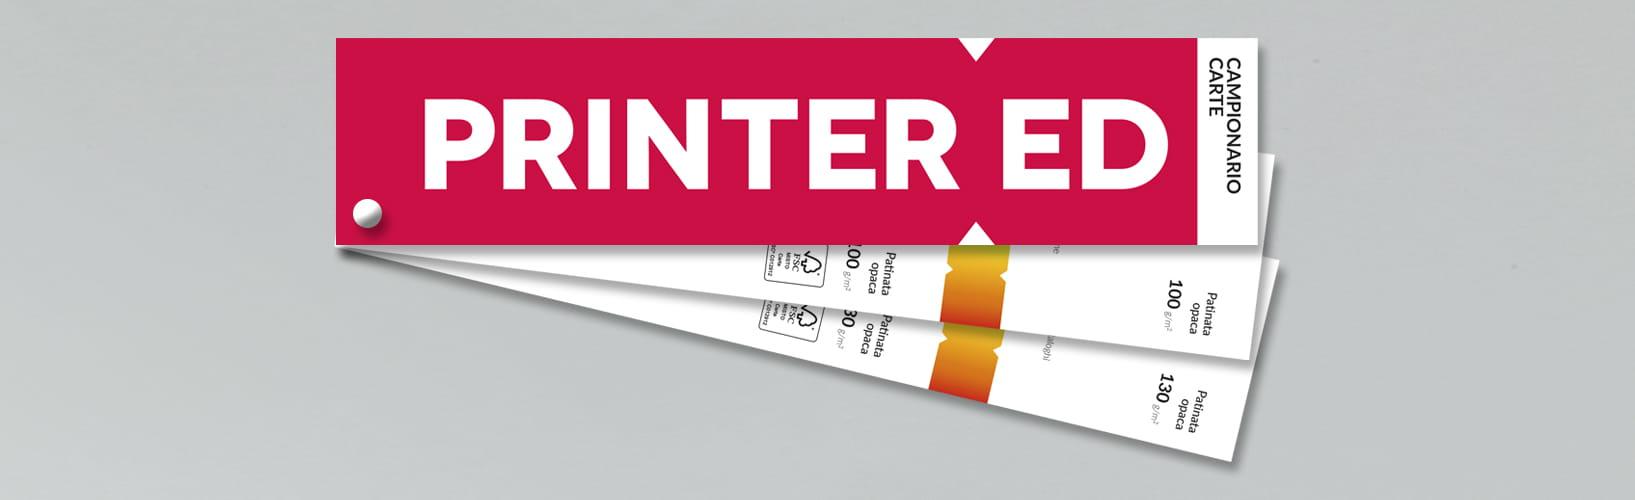 Stampa Campionario Printered